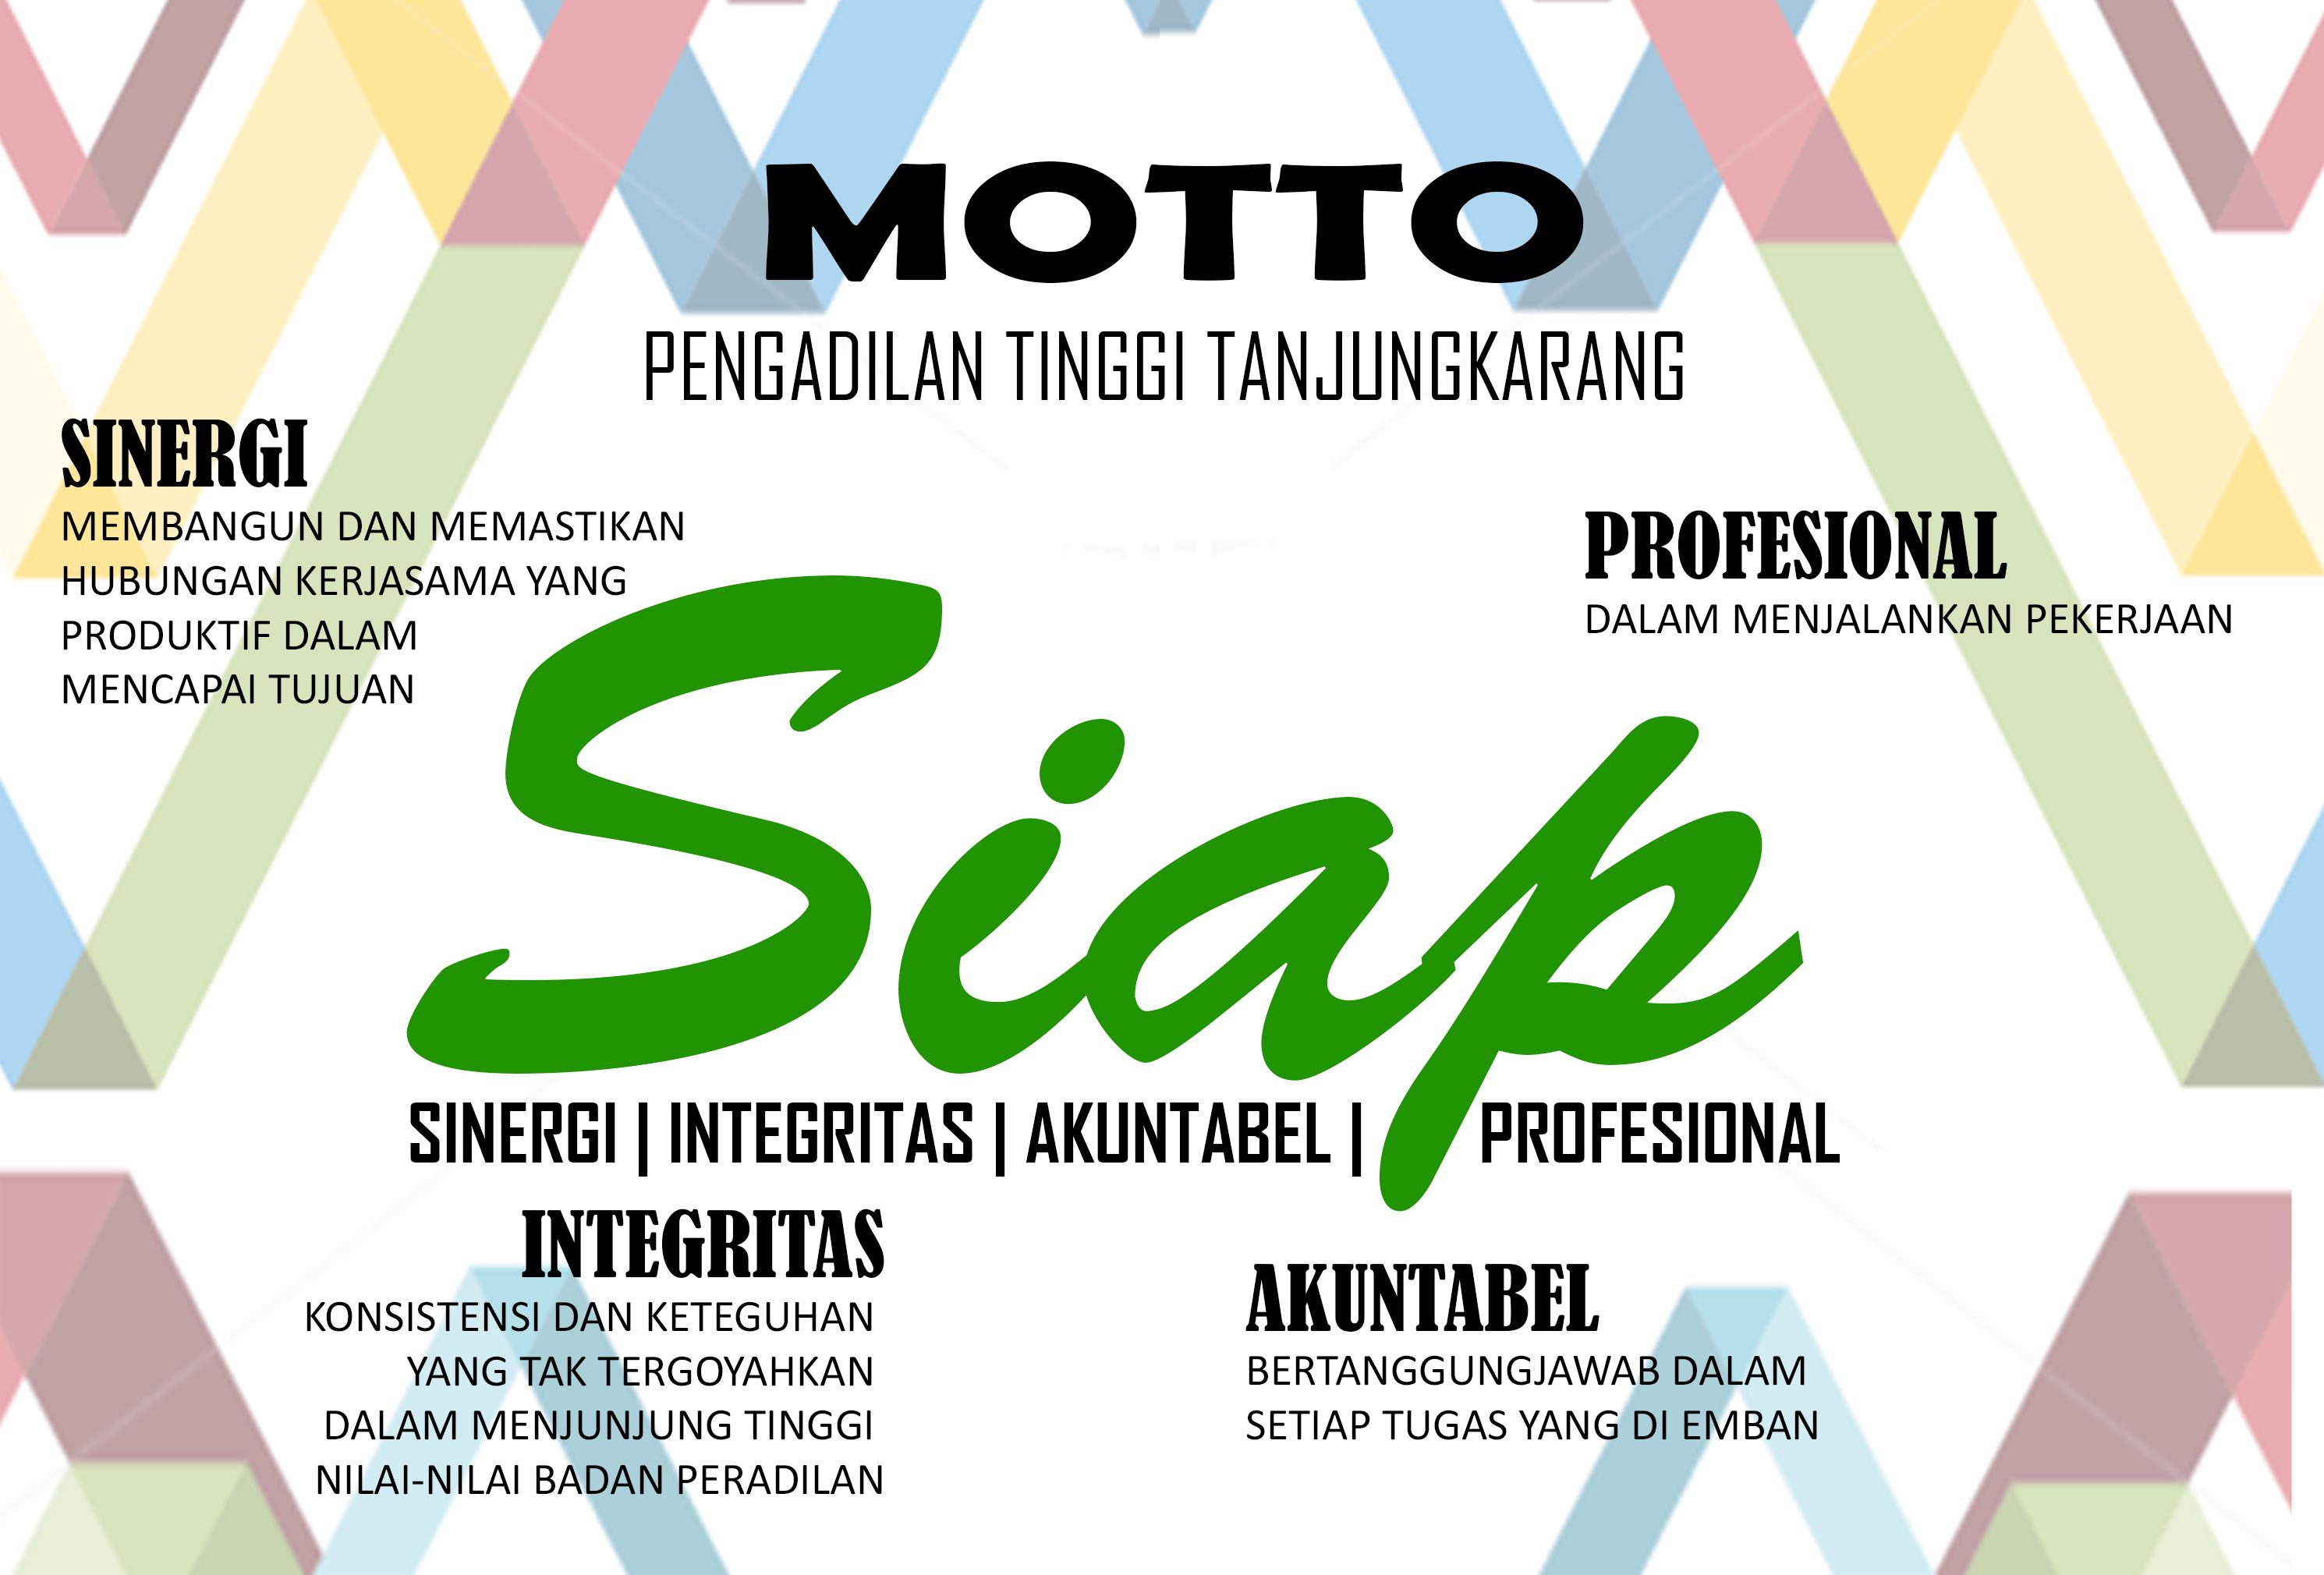 Motto Pengadilan Tinggi Tanjungkarang